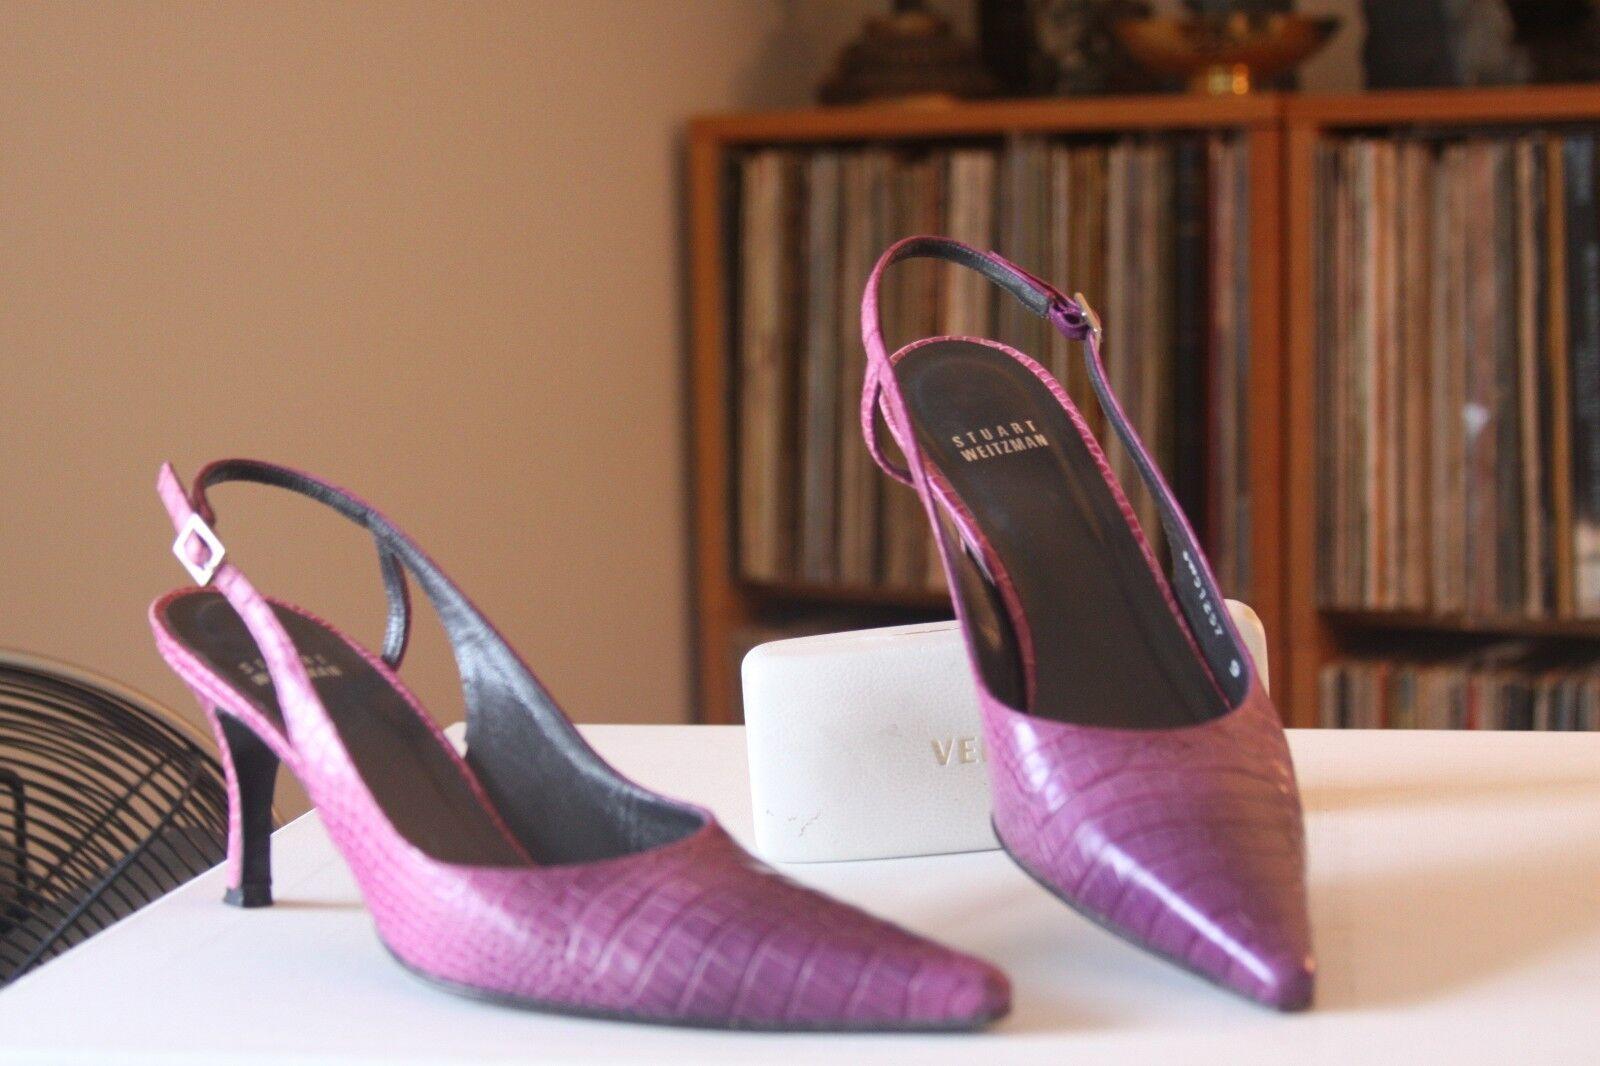 Stuart Heel Weitzman Magenta Reptile Print Leather 3 Inch Heel Stuart Slingbacks Size 9 N 0e6cad